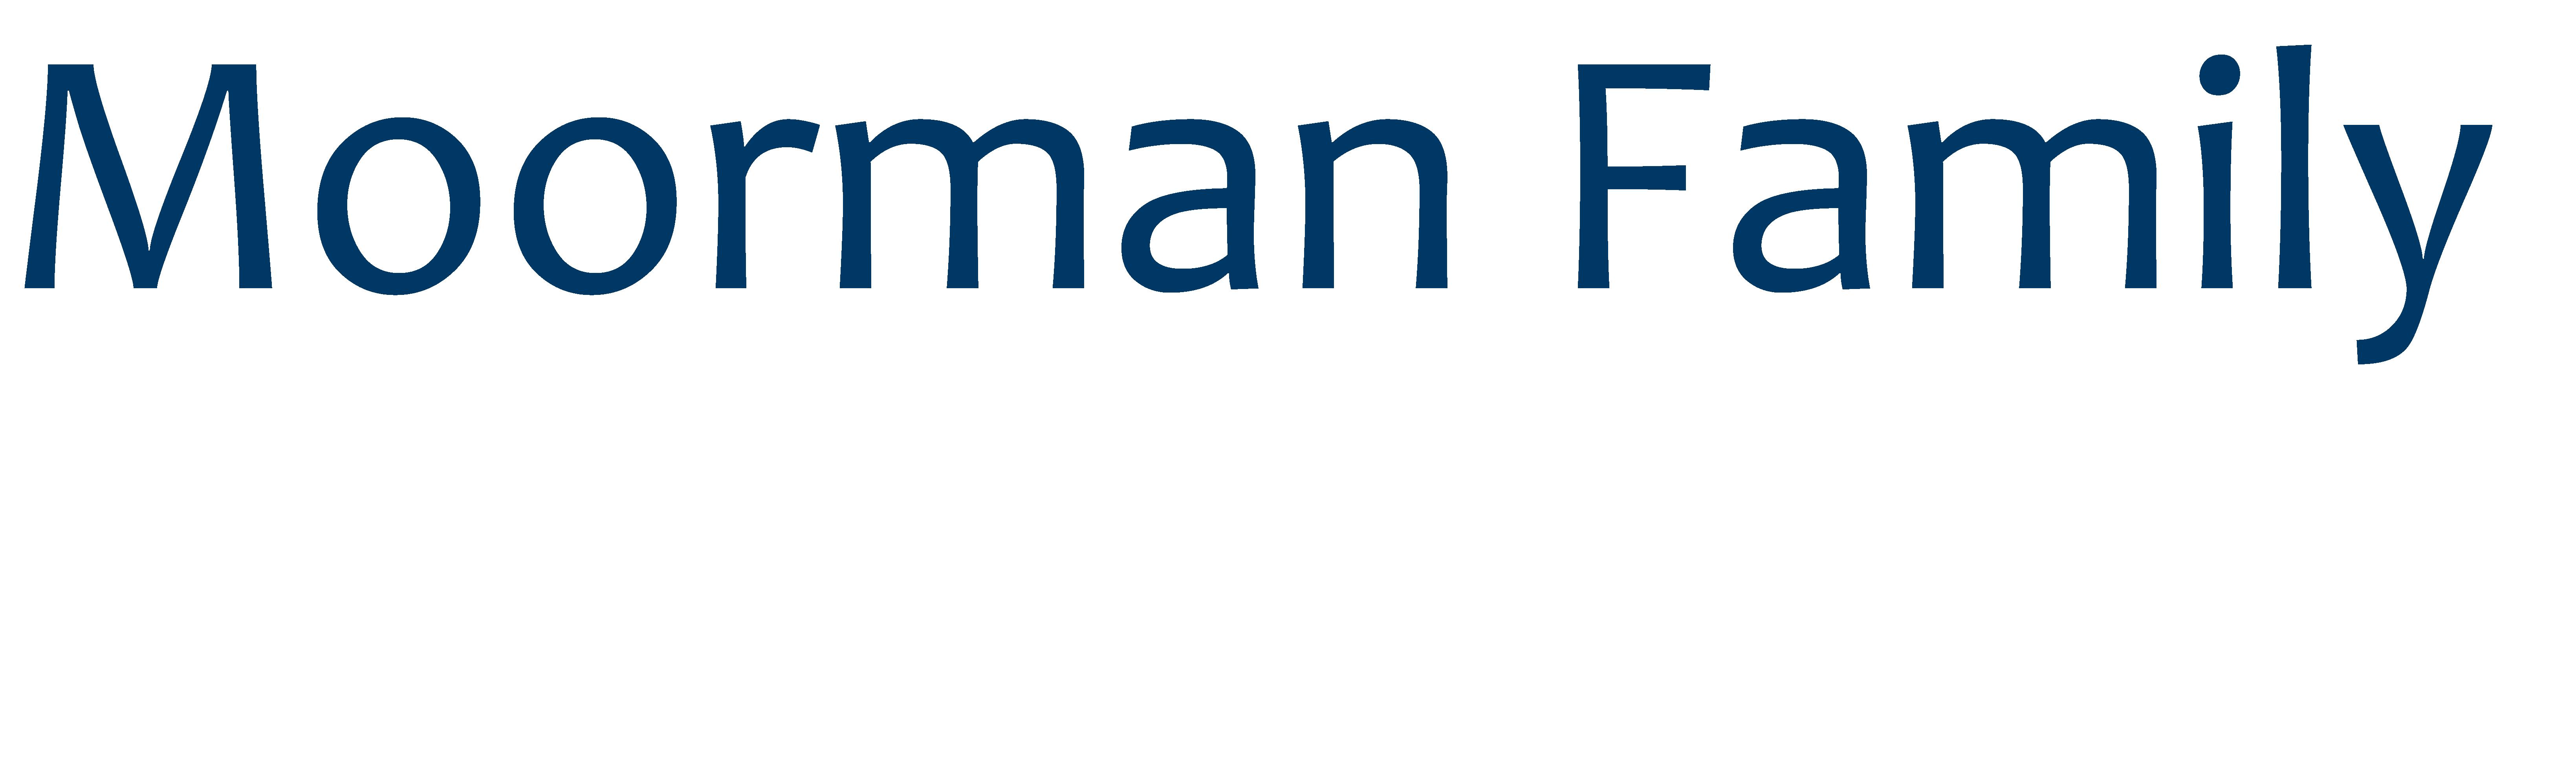 Moorman Family